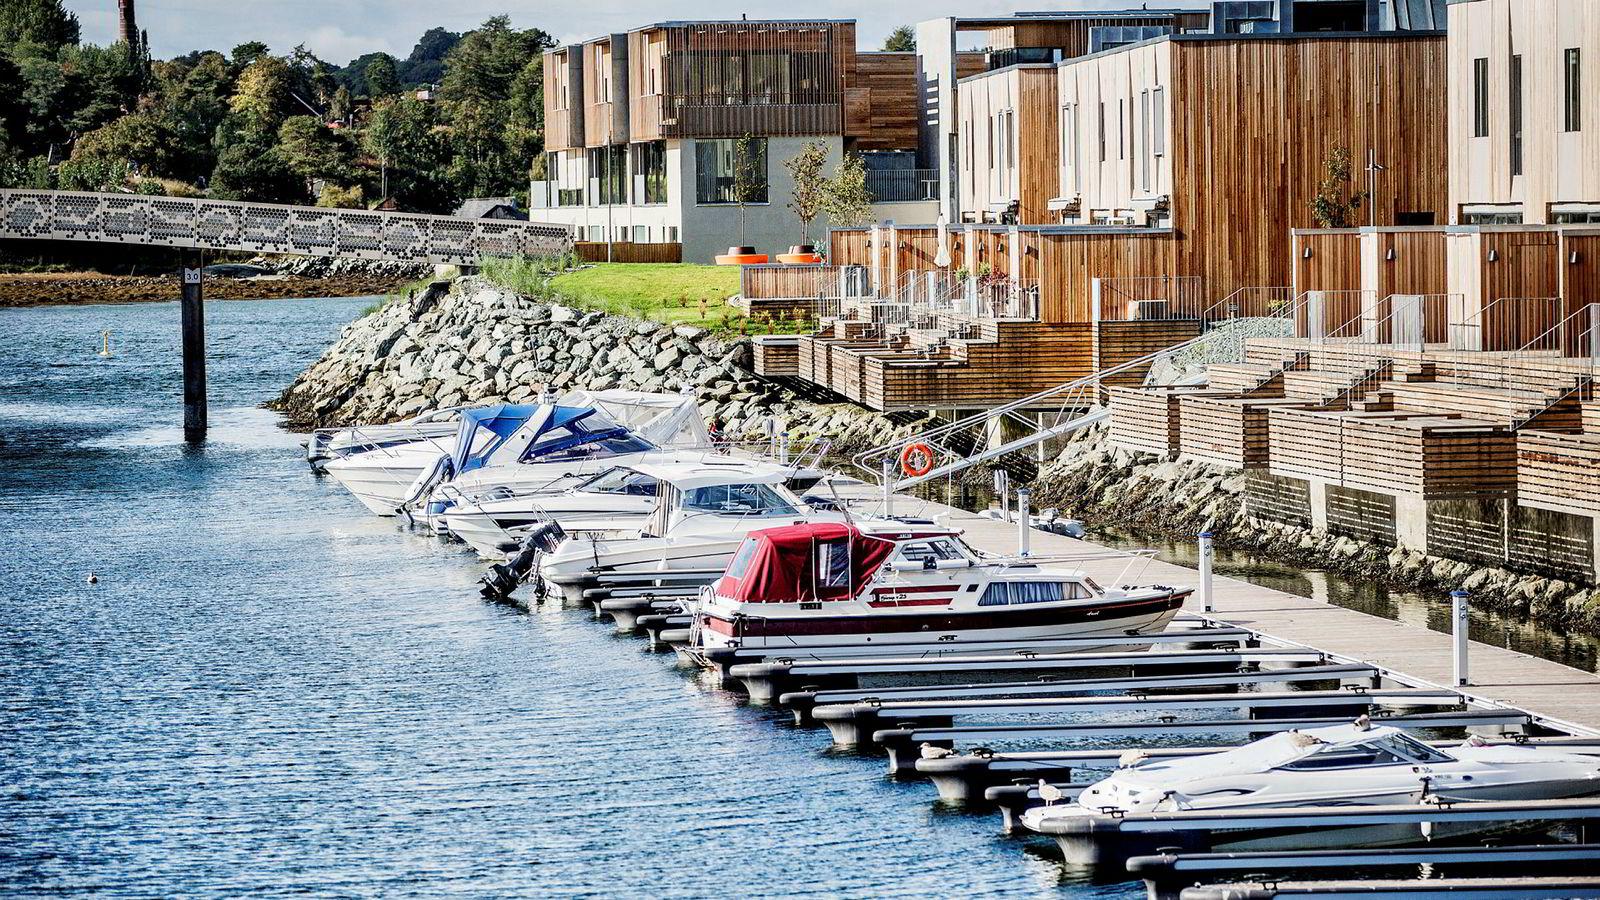 Boligprisene stiger også i mars. Bildet er fra et boligprosjekt på Ranheim i Trondheim. Foto: Øyvind Nordahl Næss